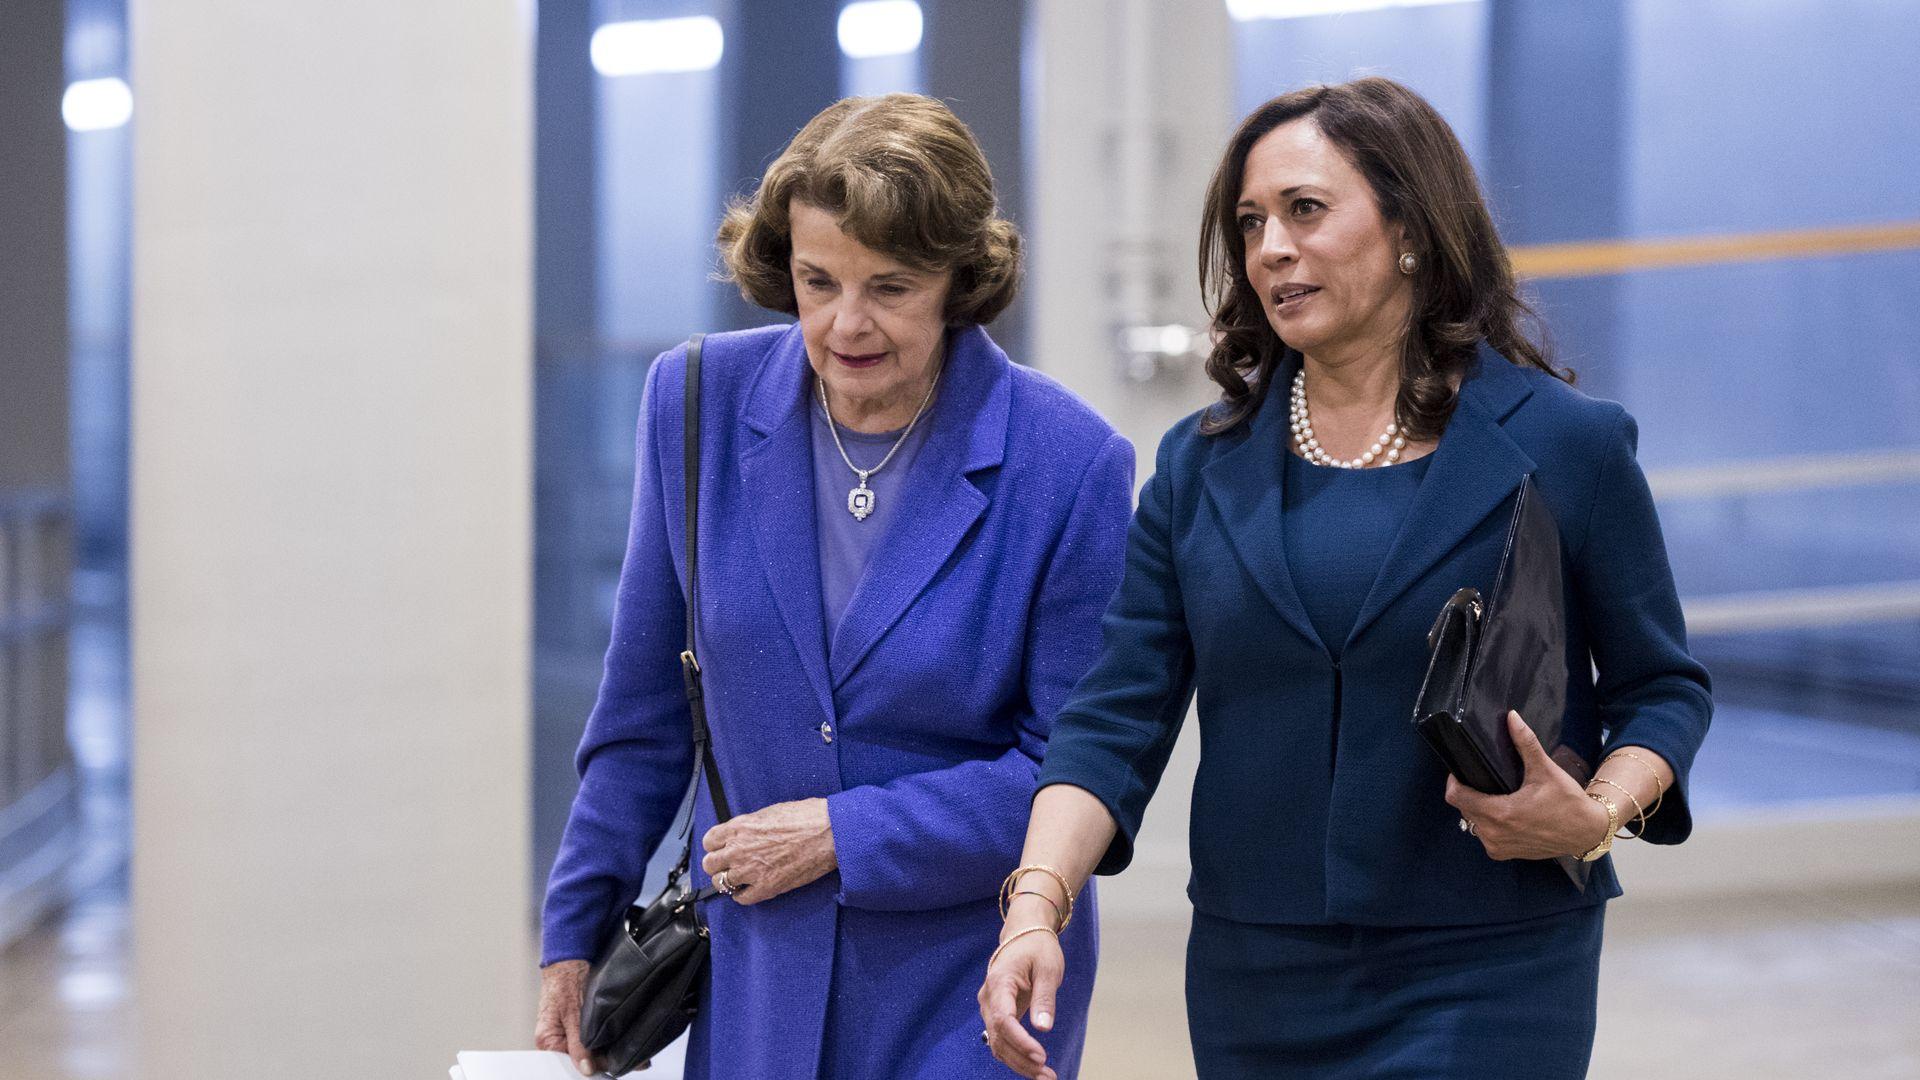 Senators Dianne Feinstein and Kamala Harris walking side by side in the Capitol building